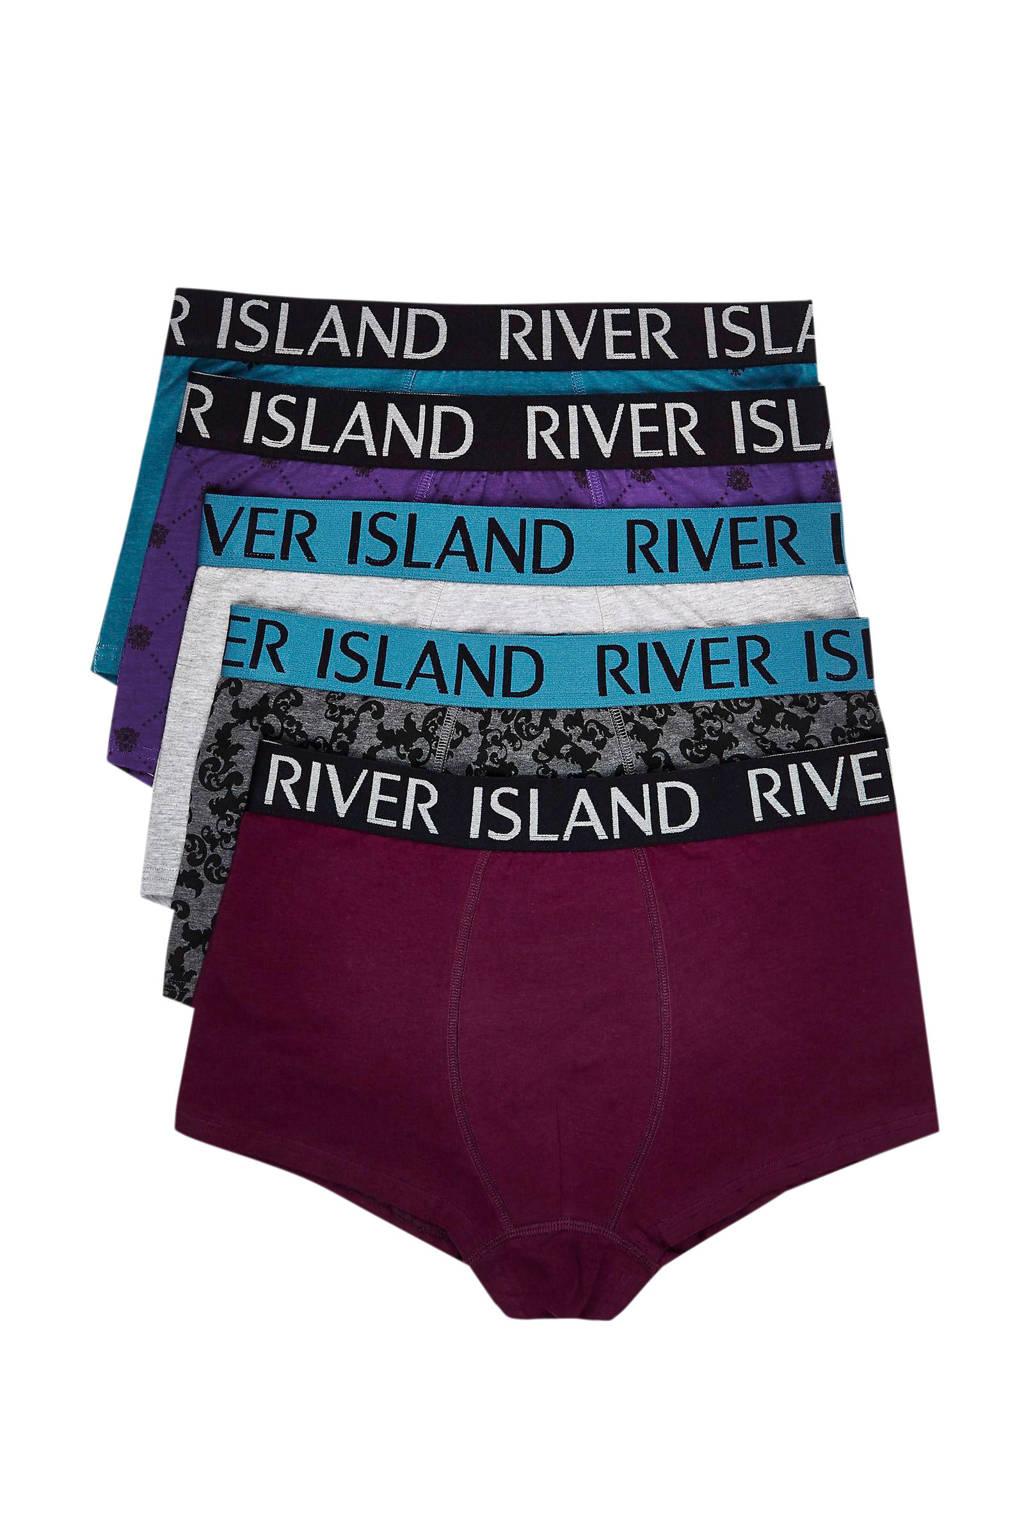 River Island boxershort (set van 5), Blauw/multi